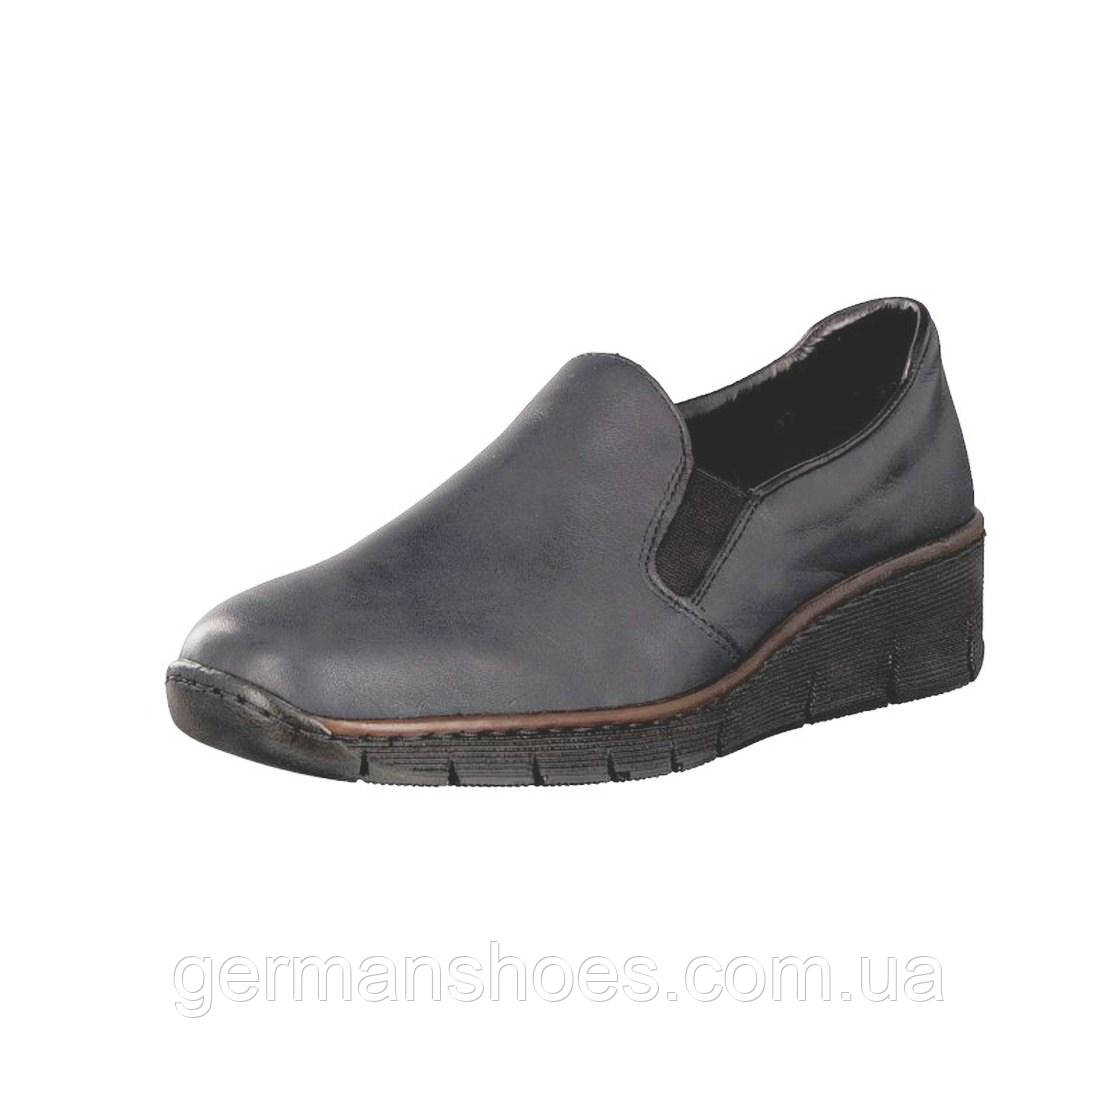 Туфли женские Rieker 53766-16